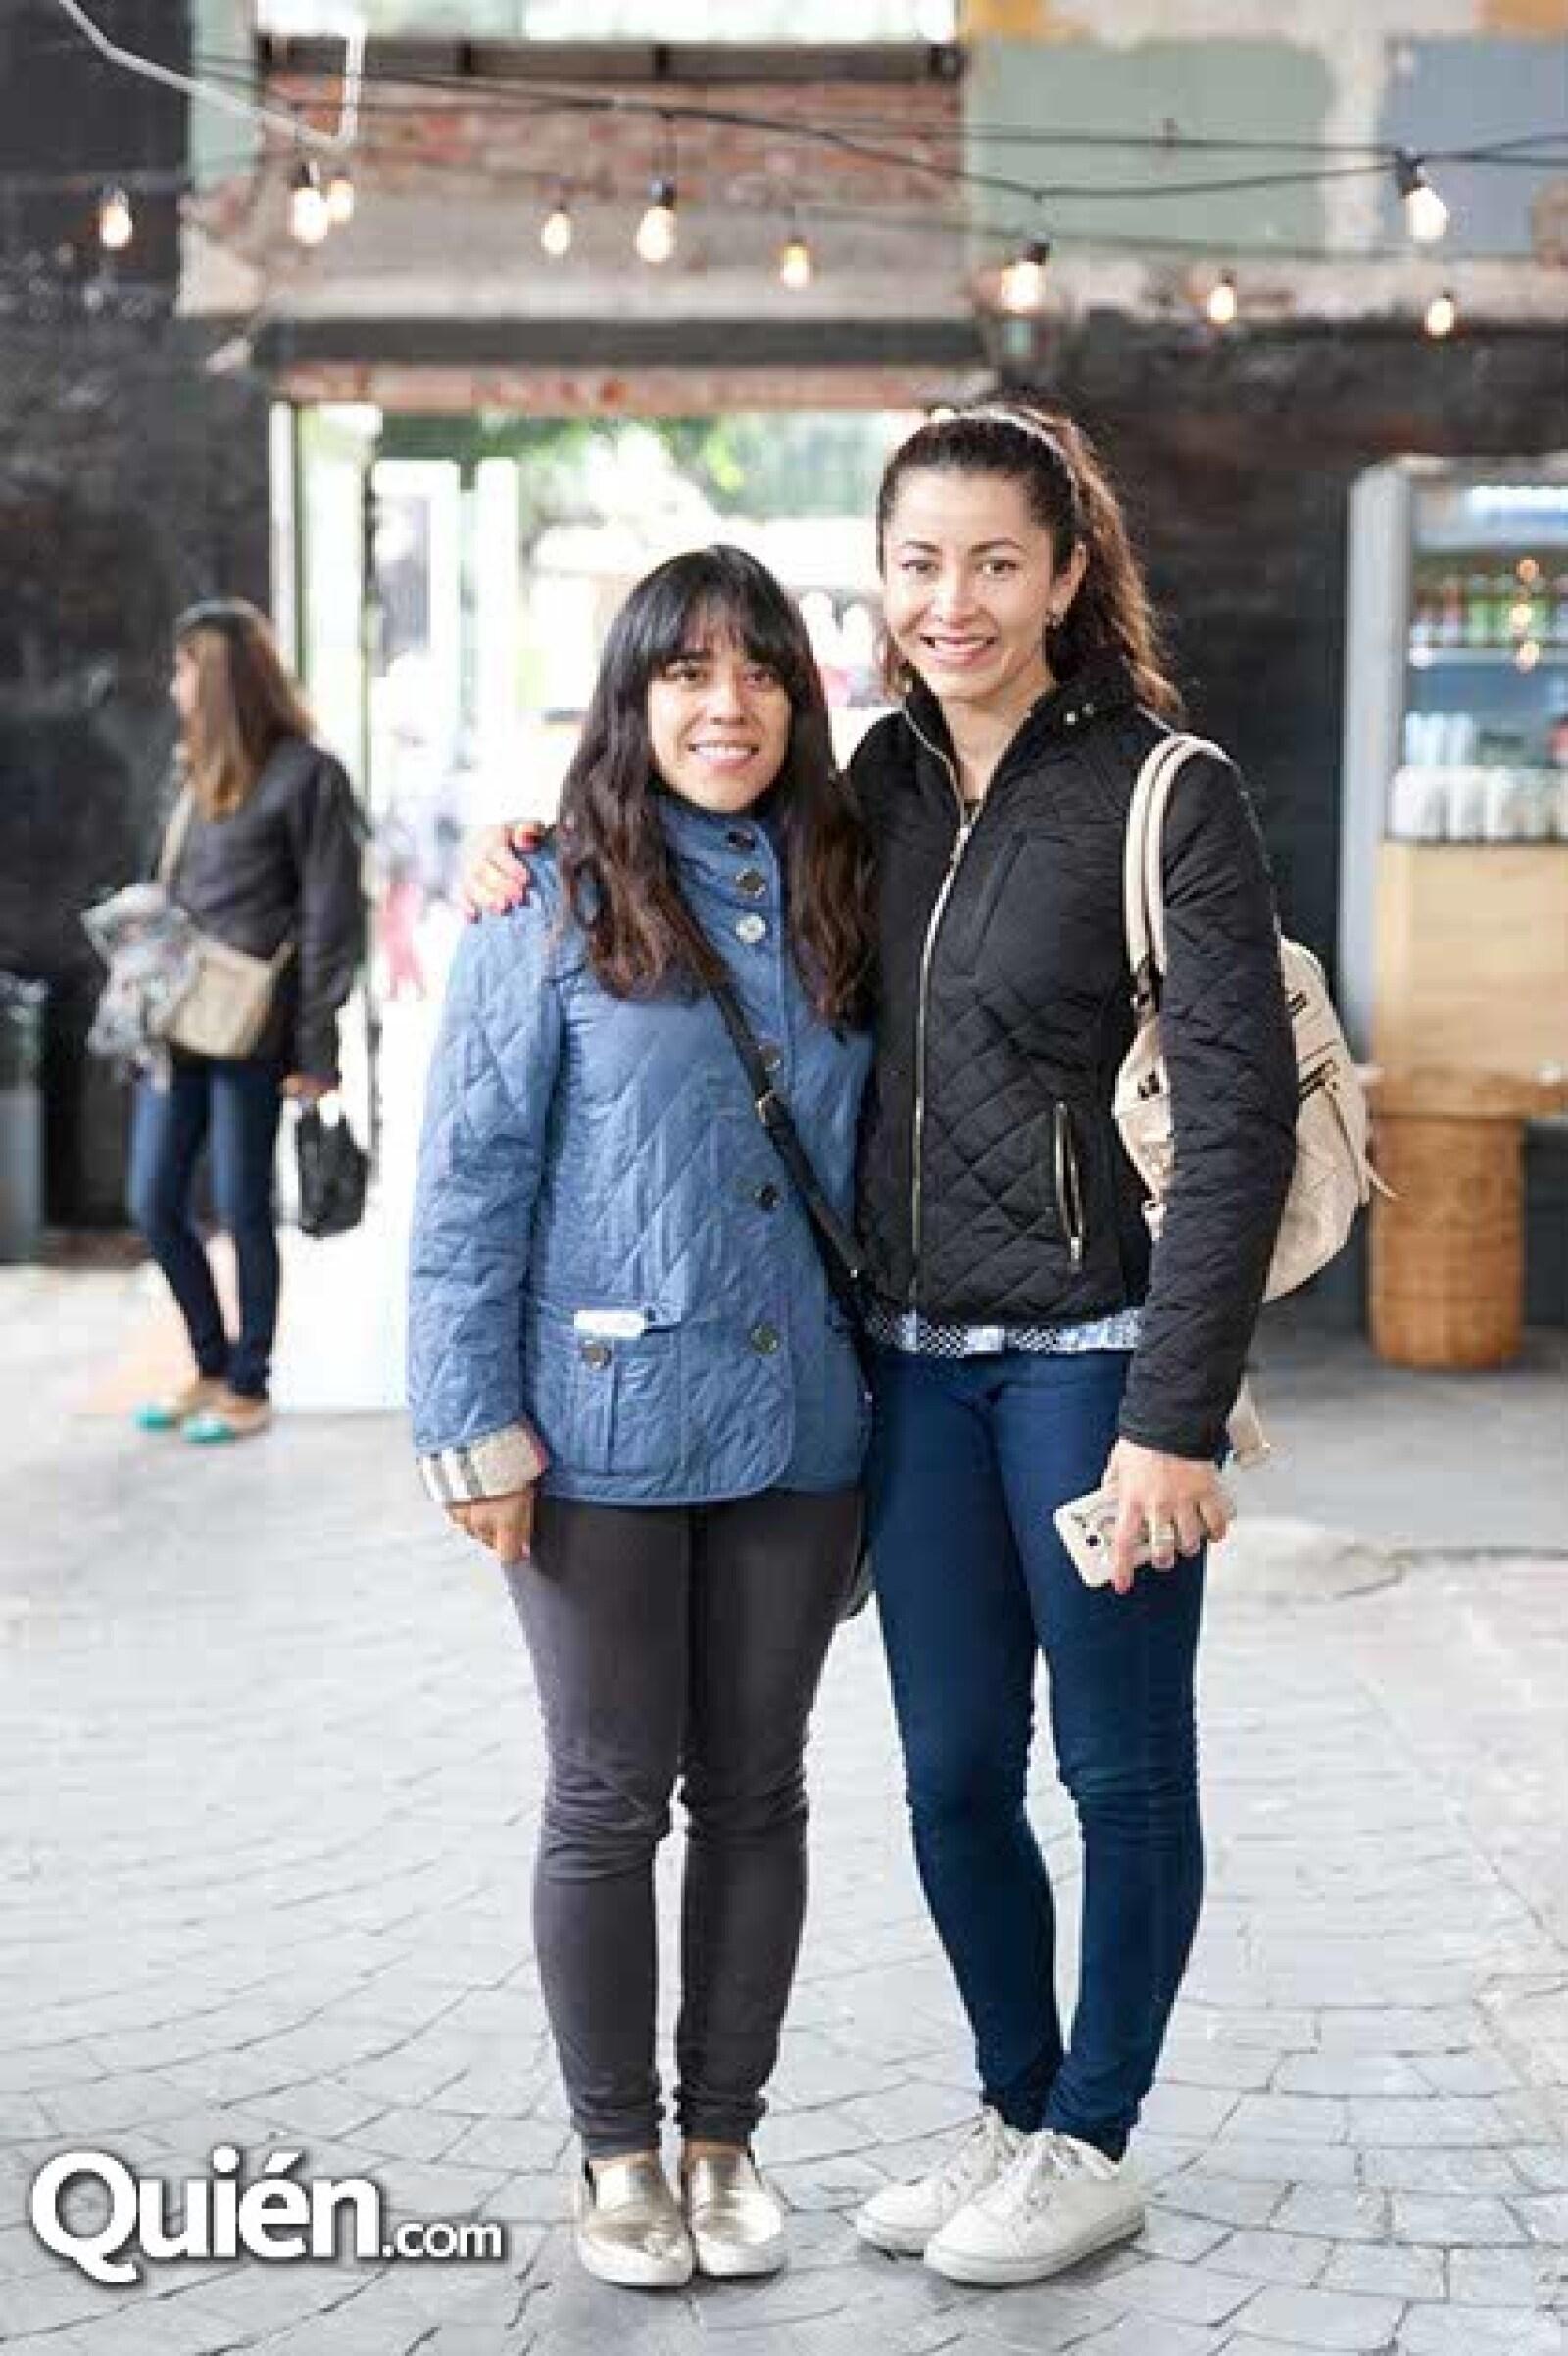 Anabelle Torres y Magda Sorcia